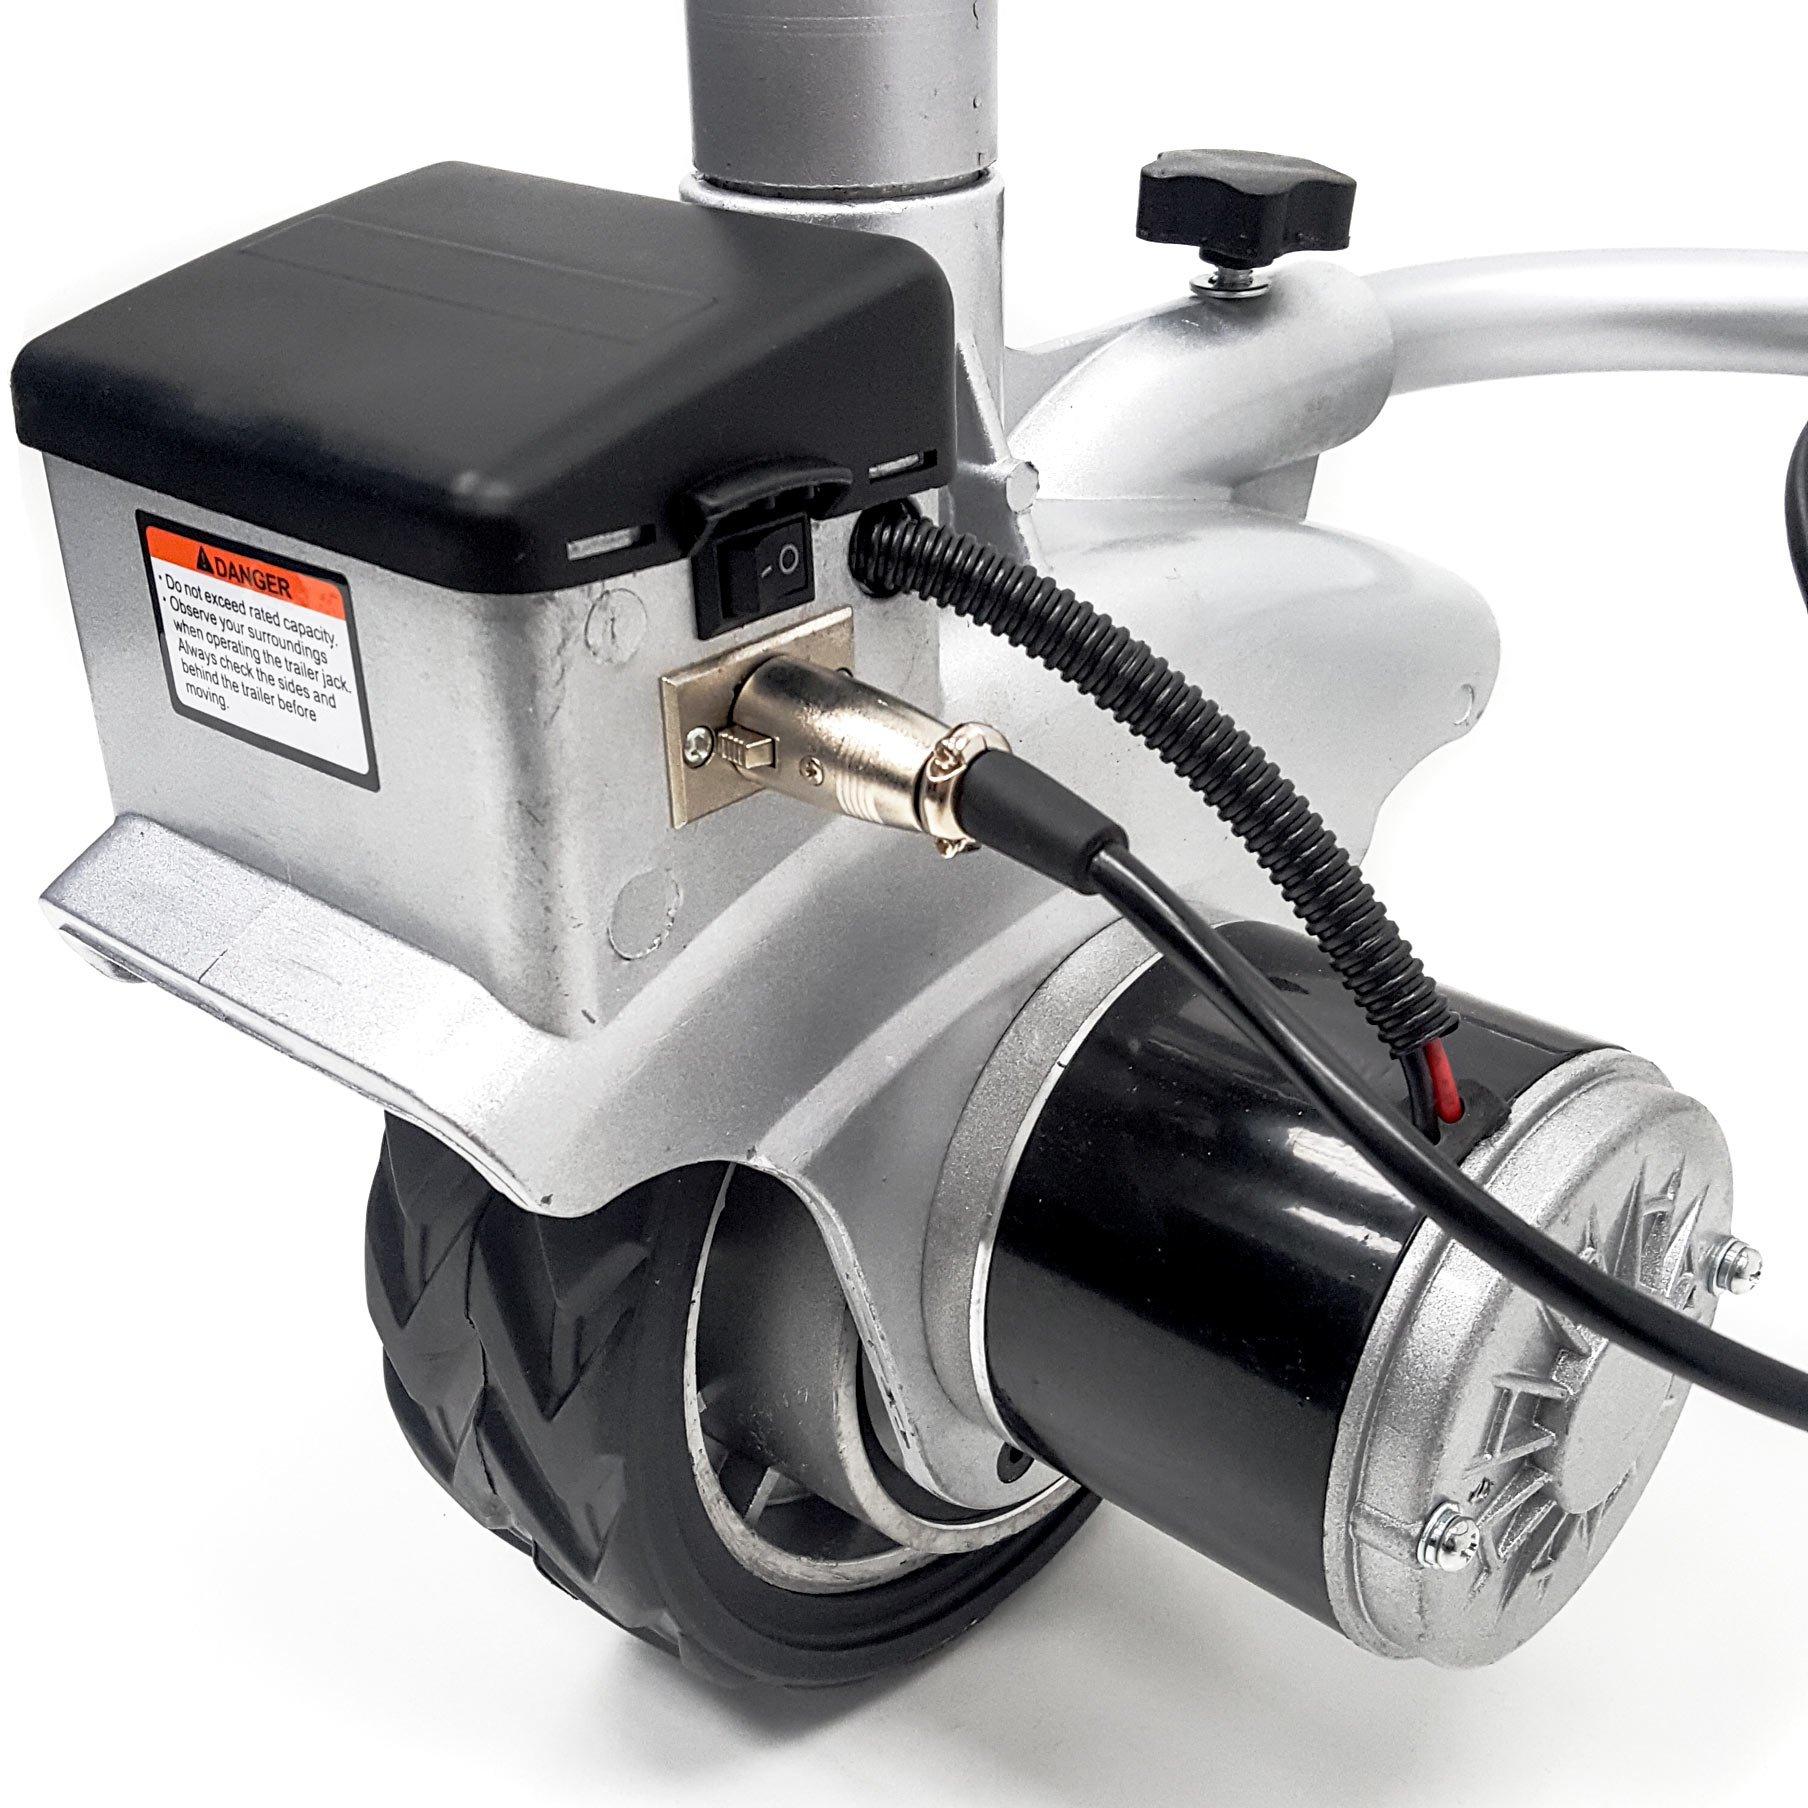 Biltek 12V Electric Mini Mover Jockey Wheel Caravan Boat Trailer Camper w/ Lock and Key + KMG Battery Included by Biltek (Image #7)